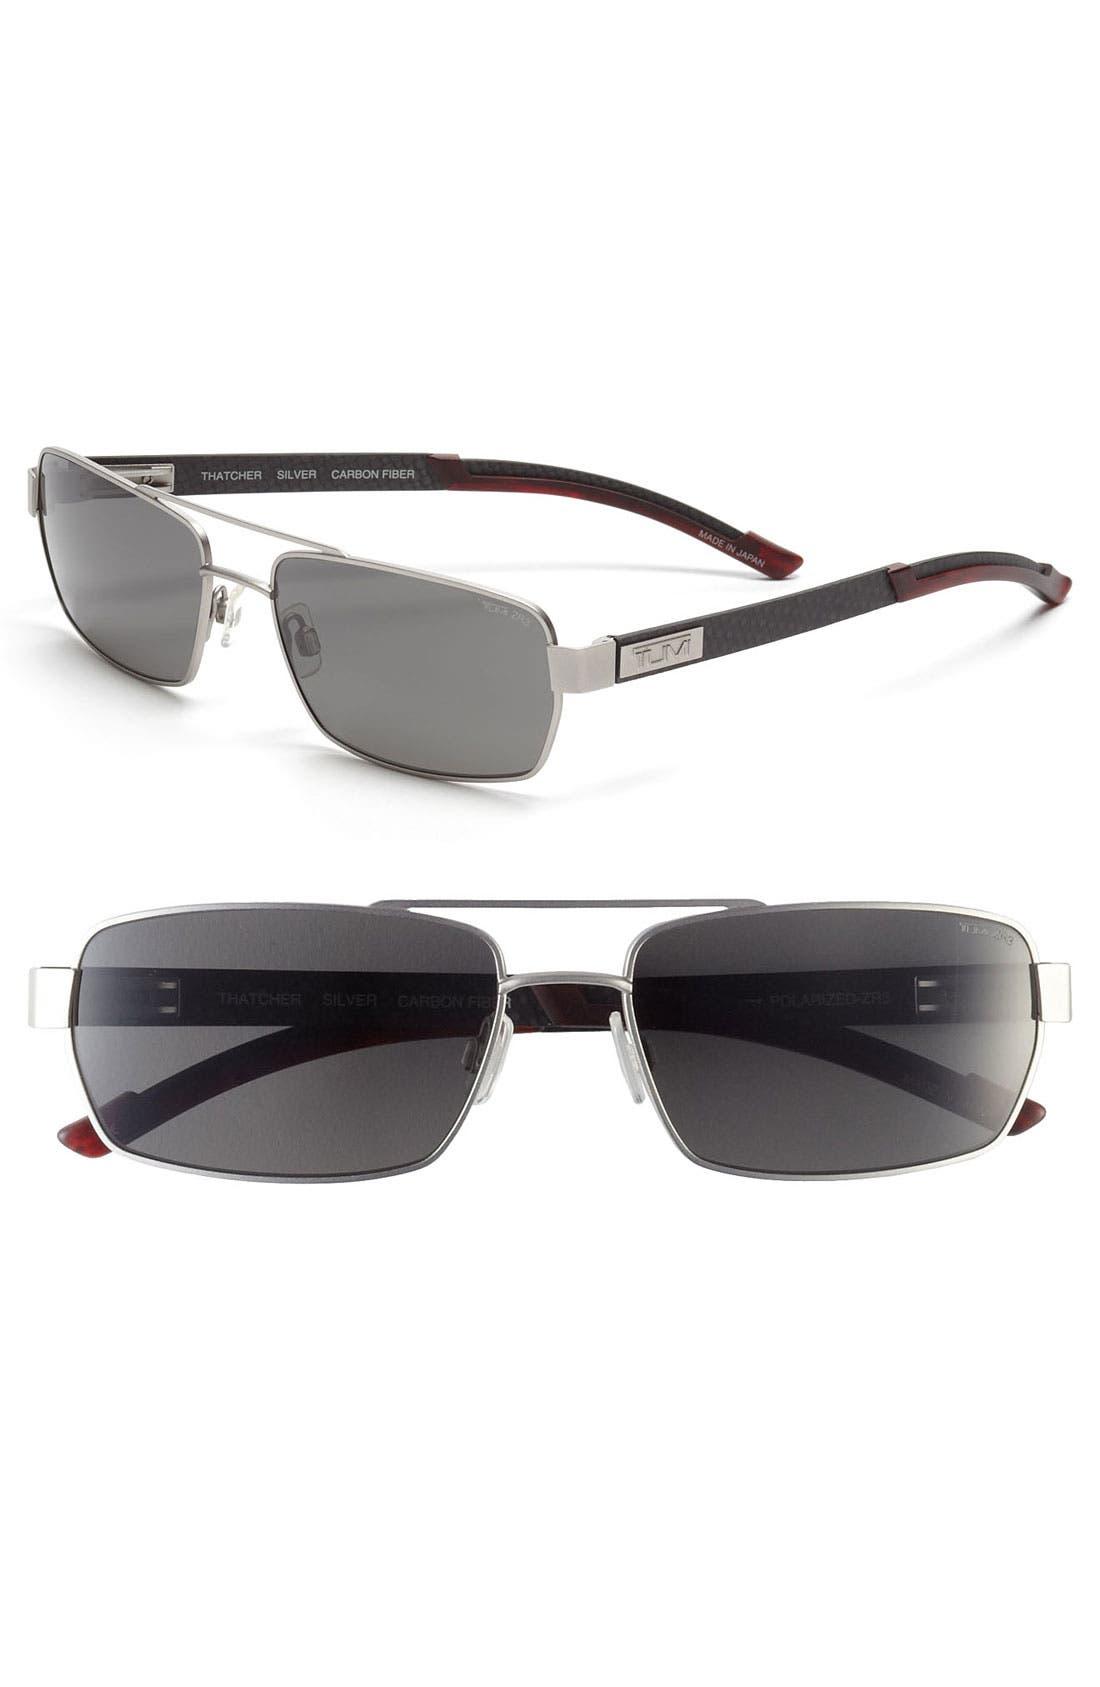 Alternate Image 1 Selected - Tumi 'Thatcher' 58mm Polarized Sunglasses